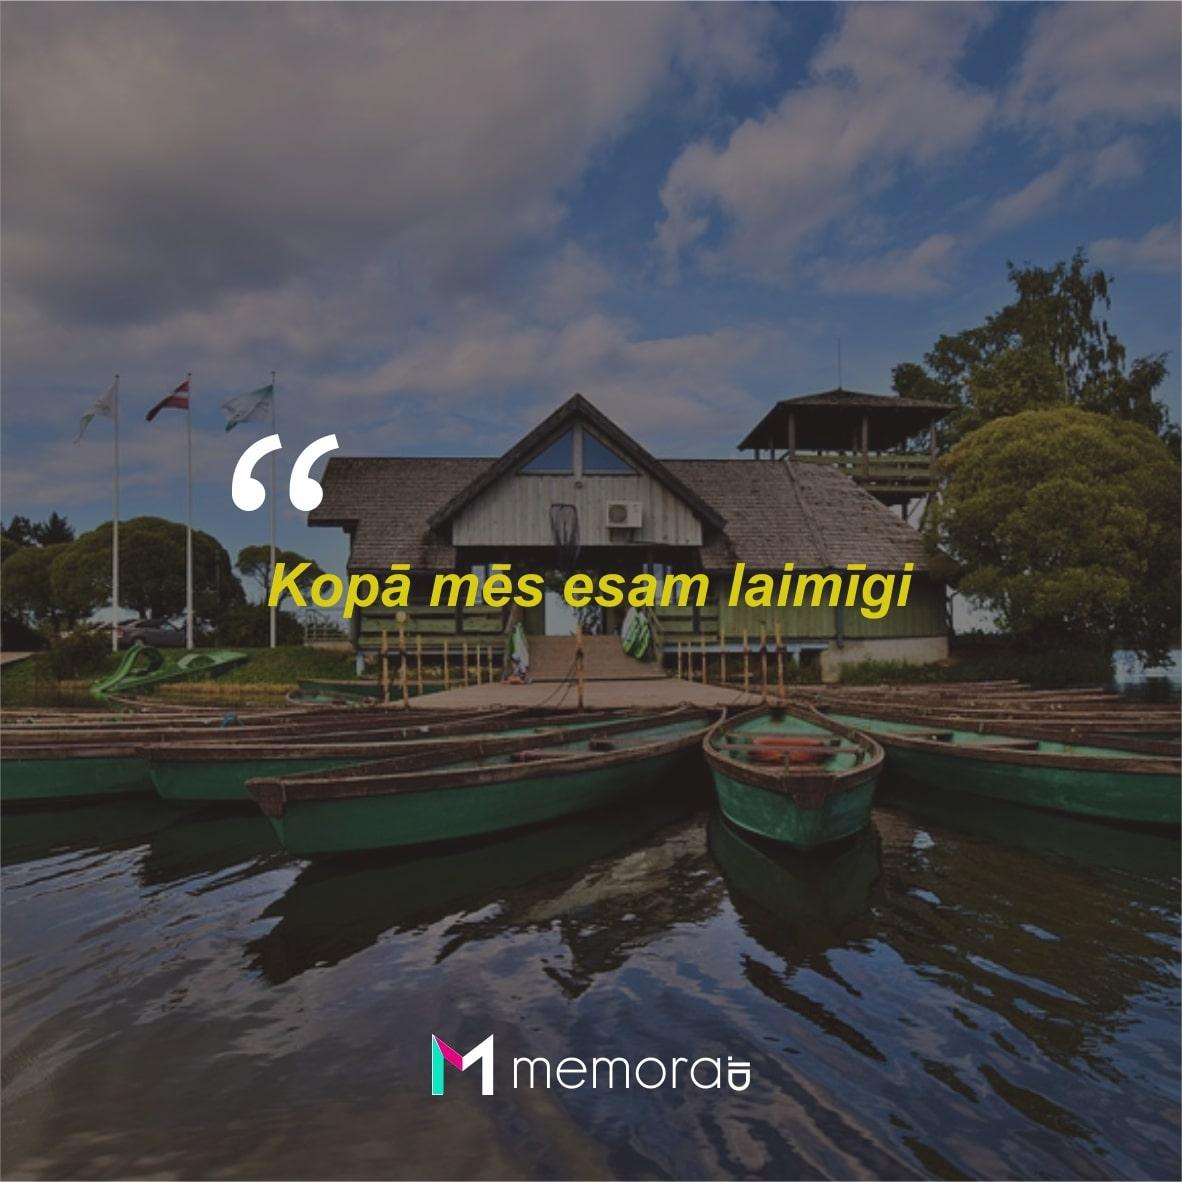 Kata-kata Cinta Romantis Bahasa Latvia